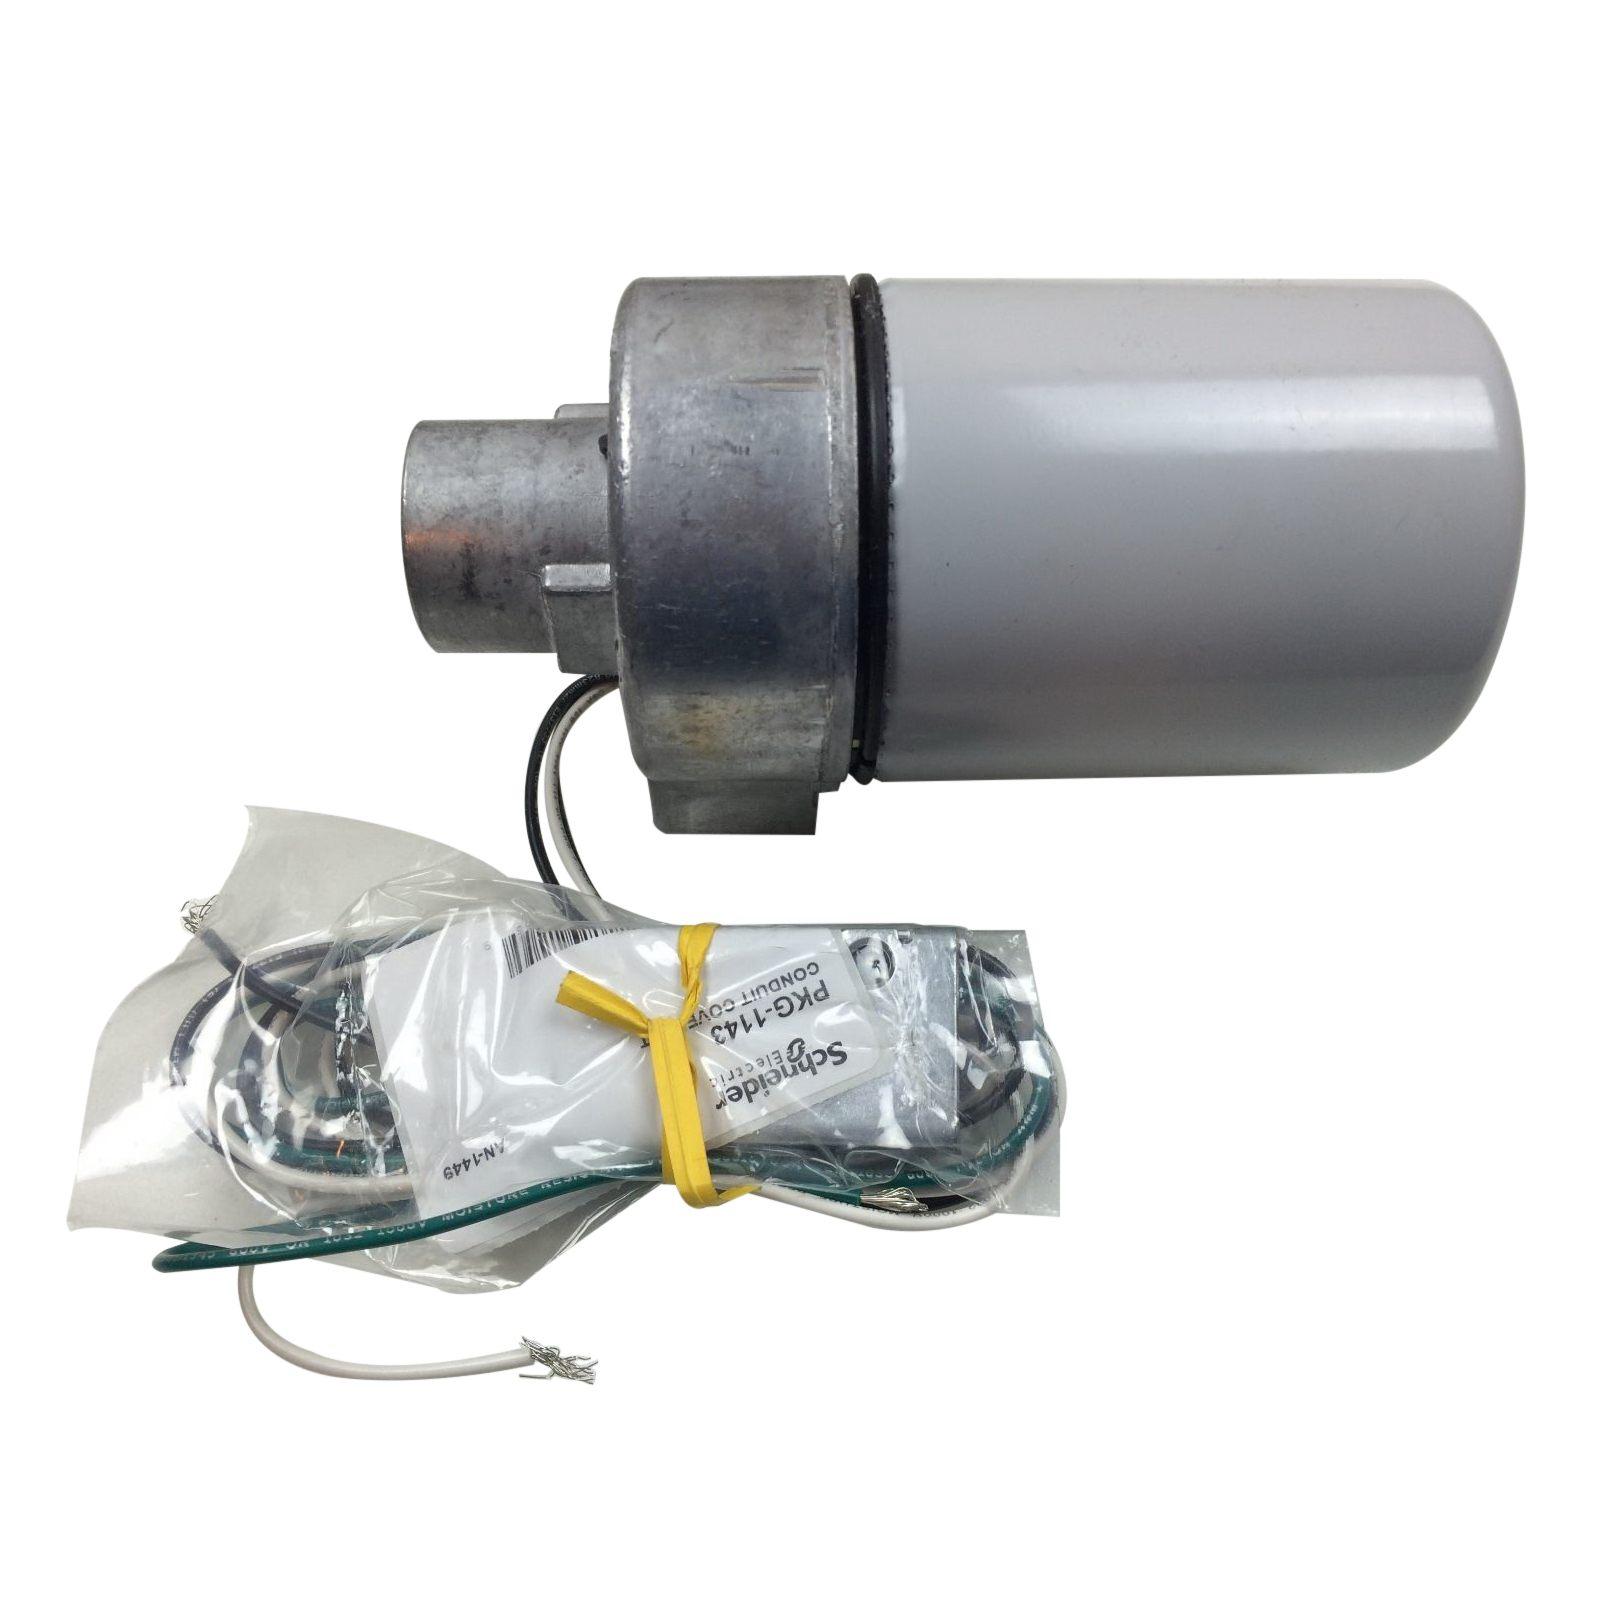 MA-5210 Schneider Electric Valve Actuator